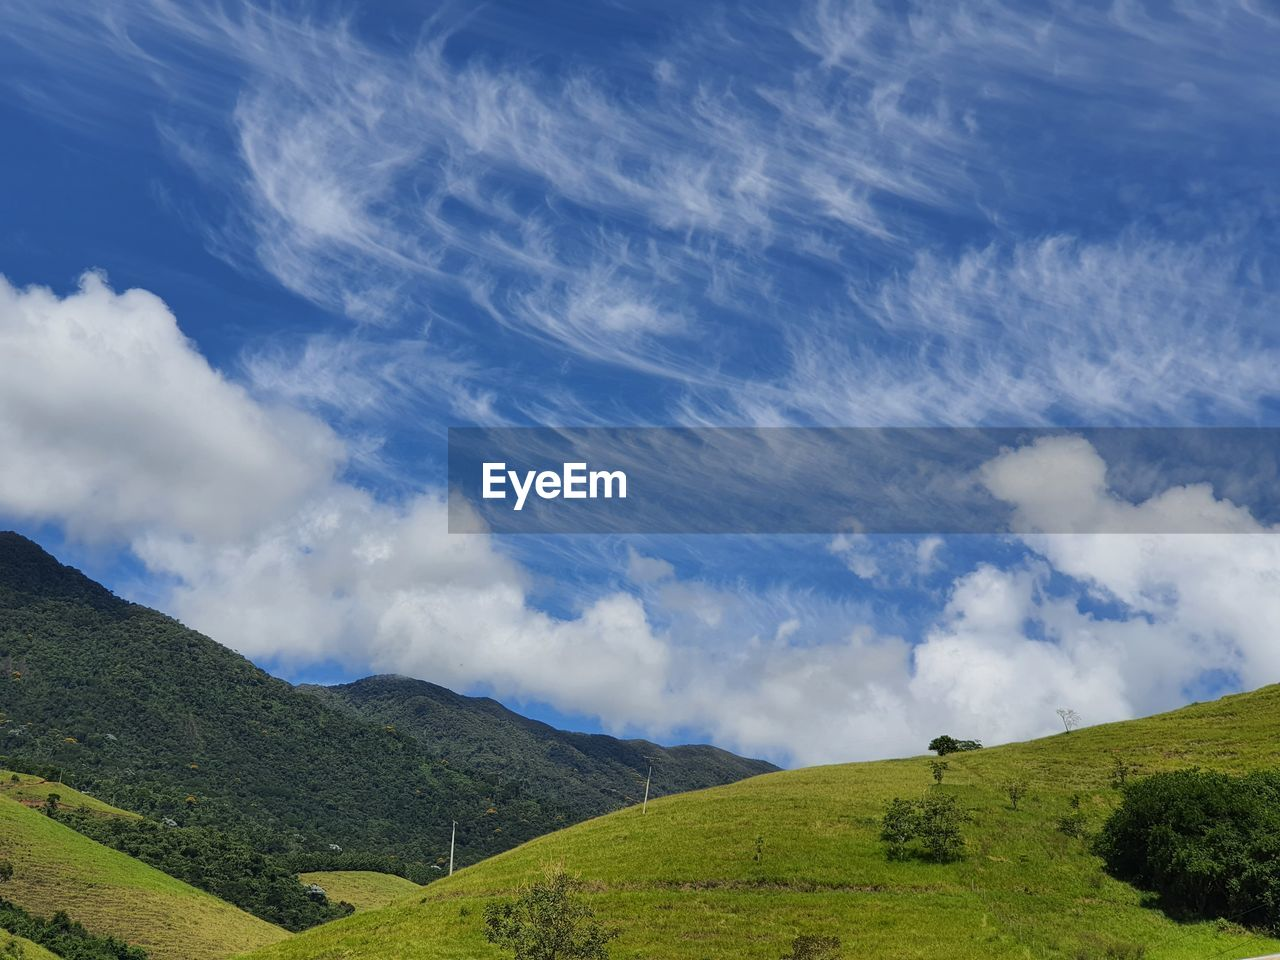 IDYLLIC SHOT OF GREEN LANDSCAPE AGAINST SKY